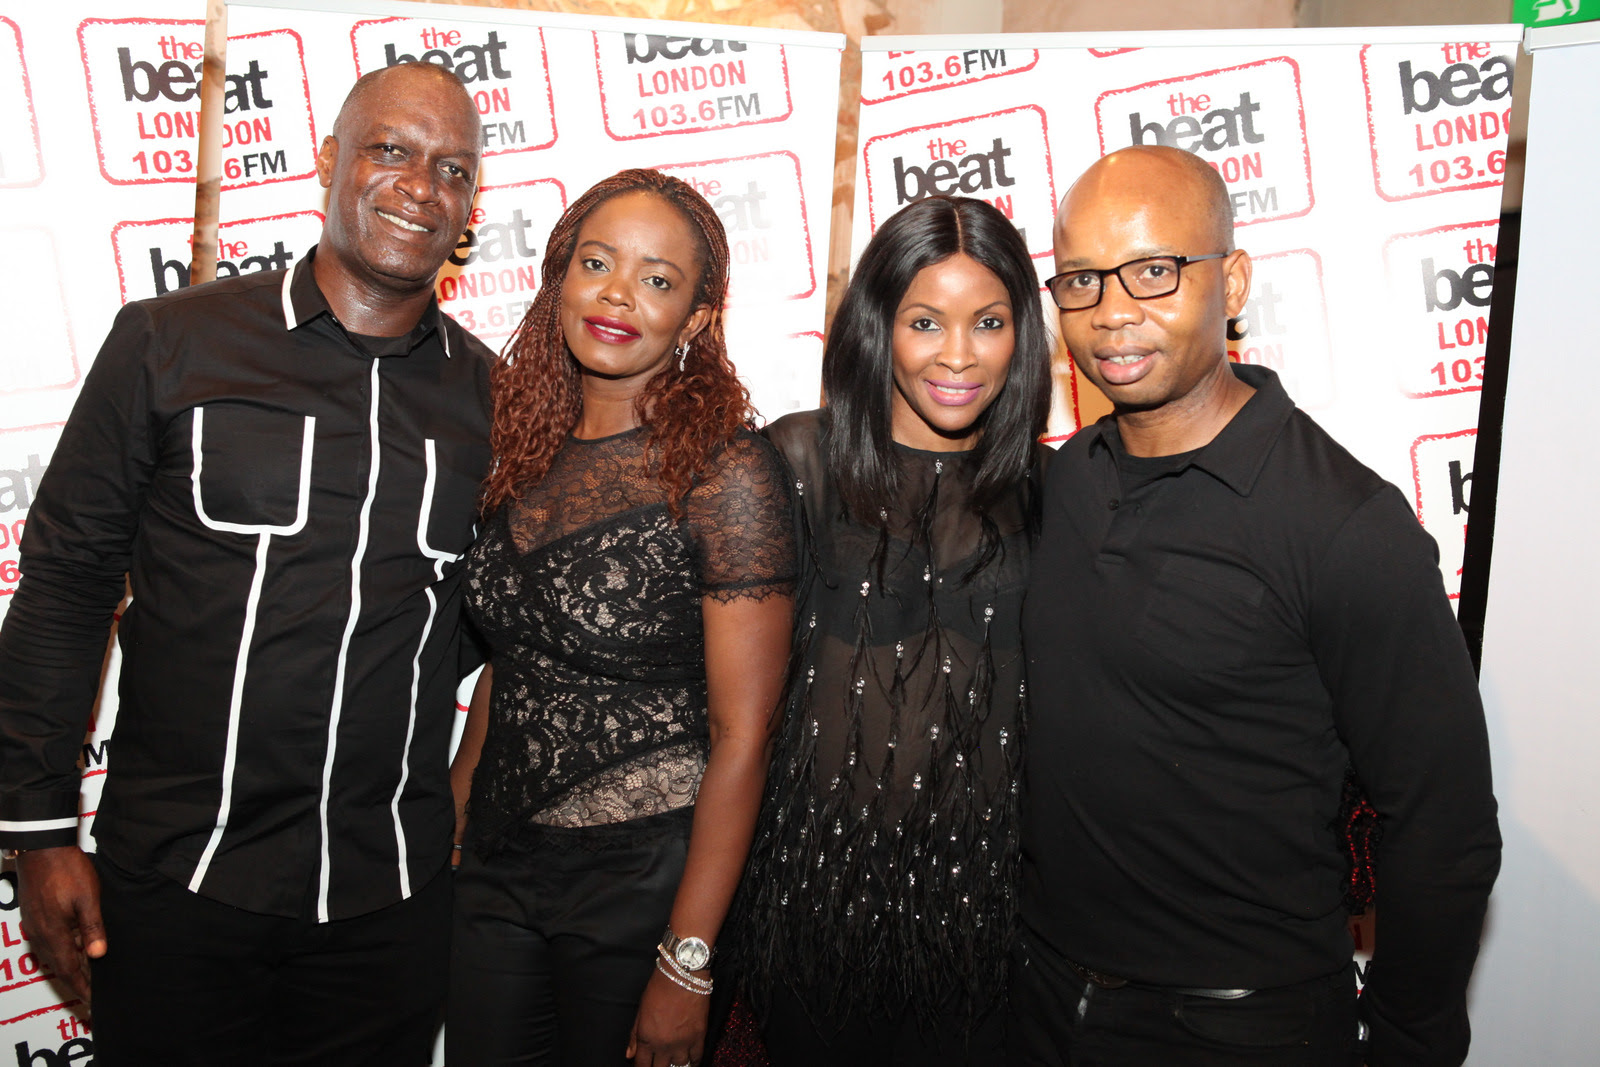 Uzoma Dozie, Alex Amosu, Deji Awokoya, DJ Cuppy, Toolz, Shiikane Join Chris Ubosi At The Beat London 103.6FM Launch Party